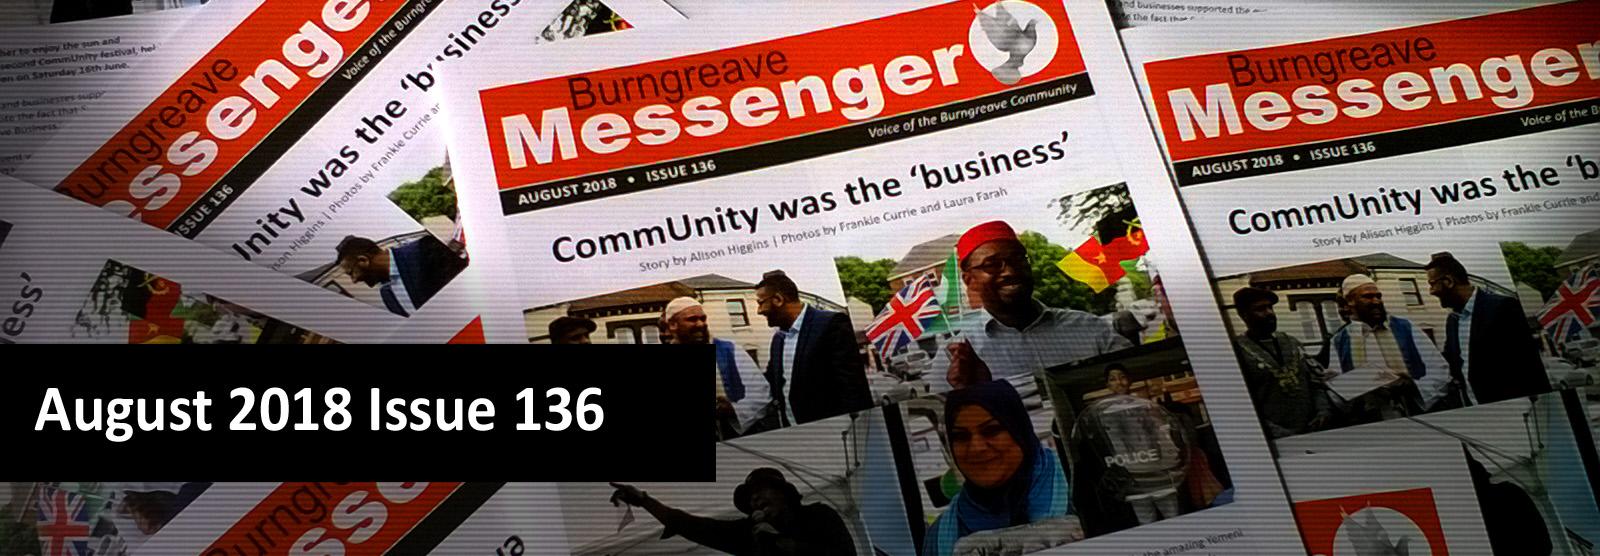 Messenger spread Aug 2018 header small